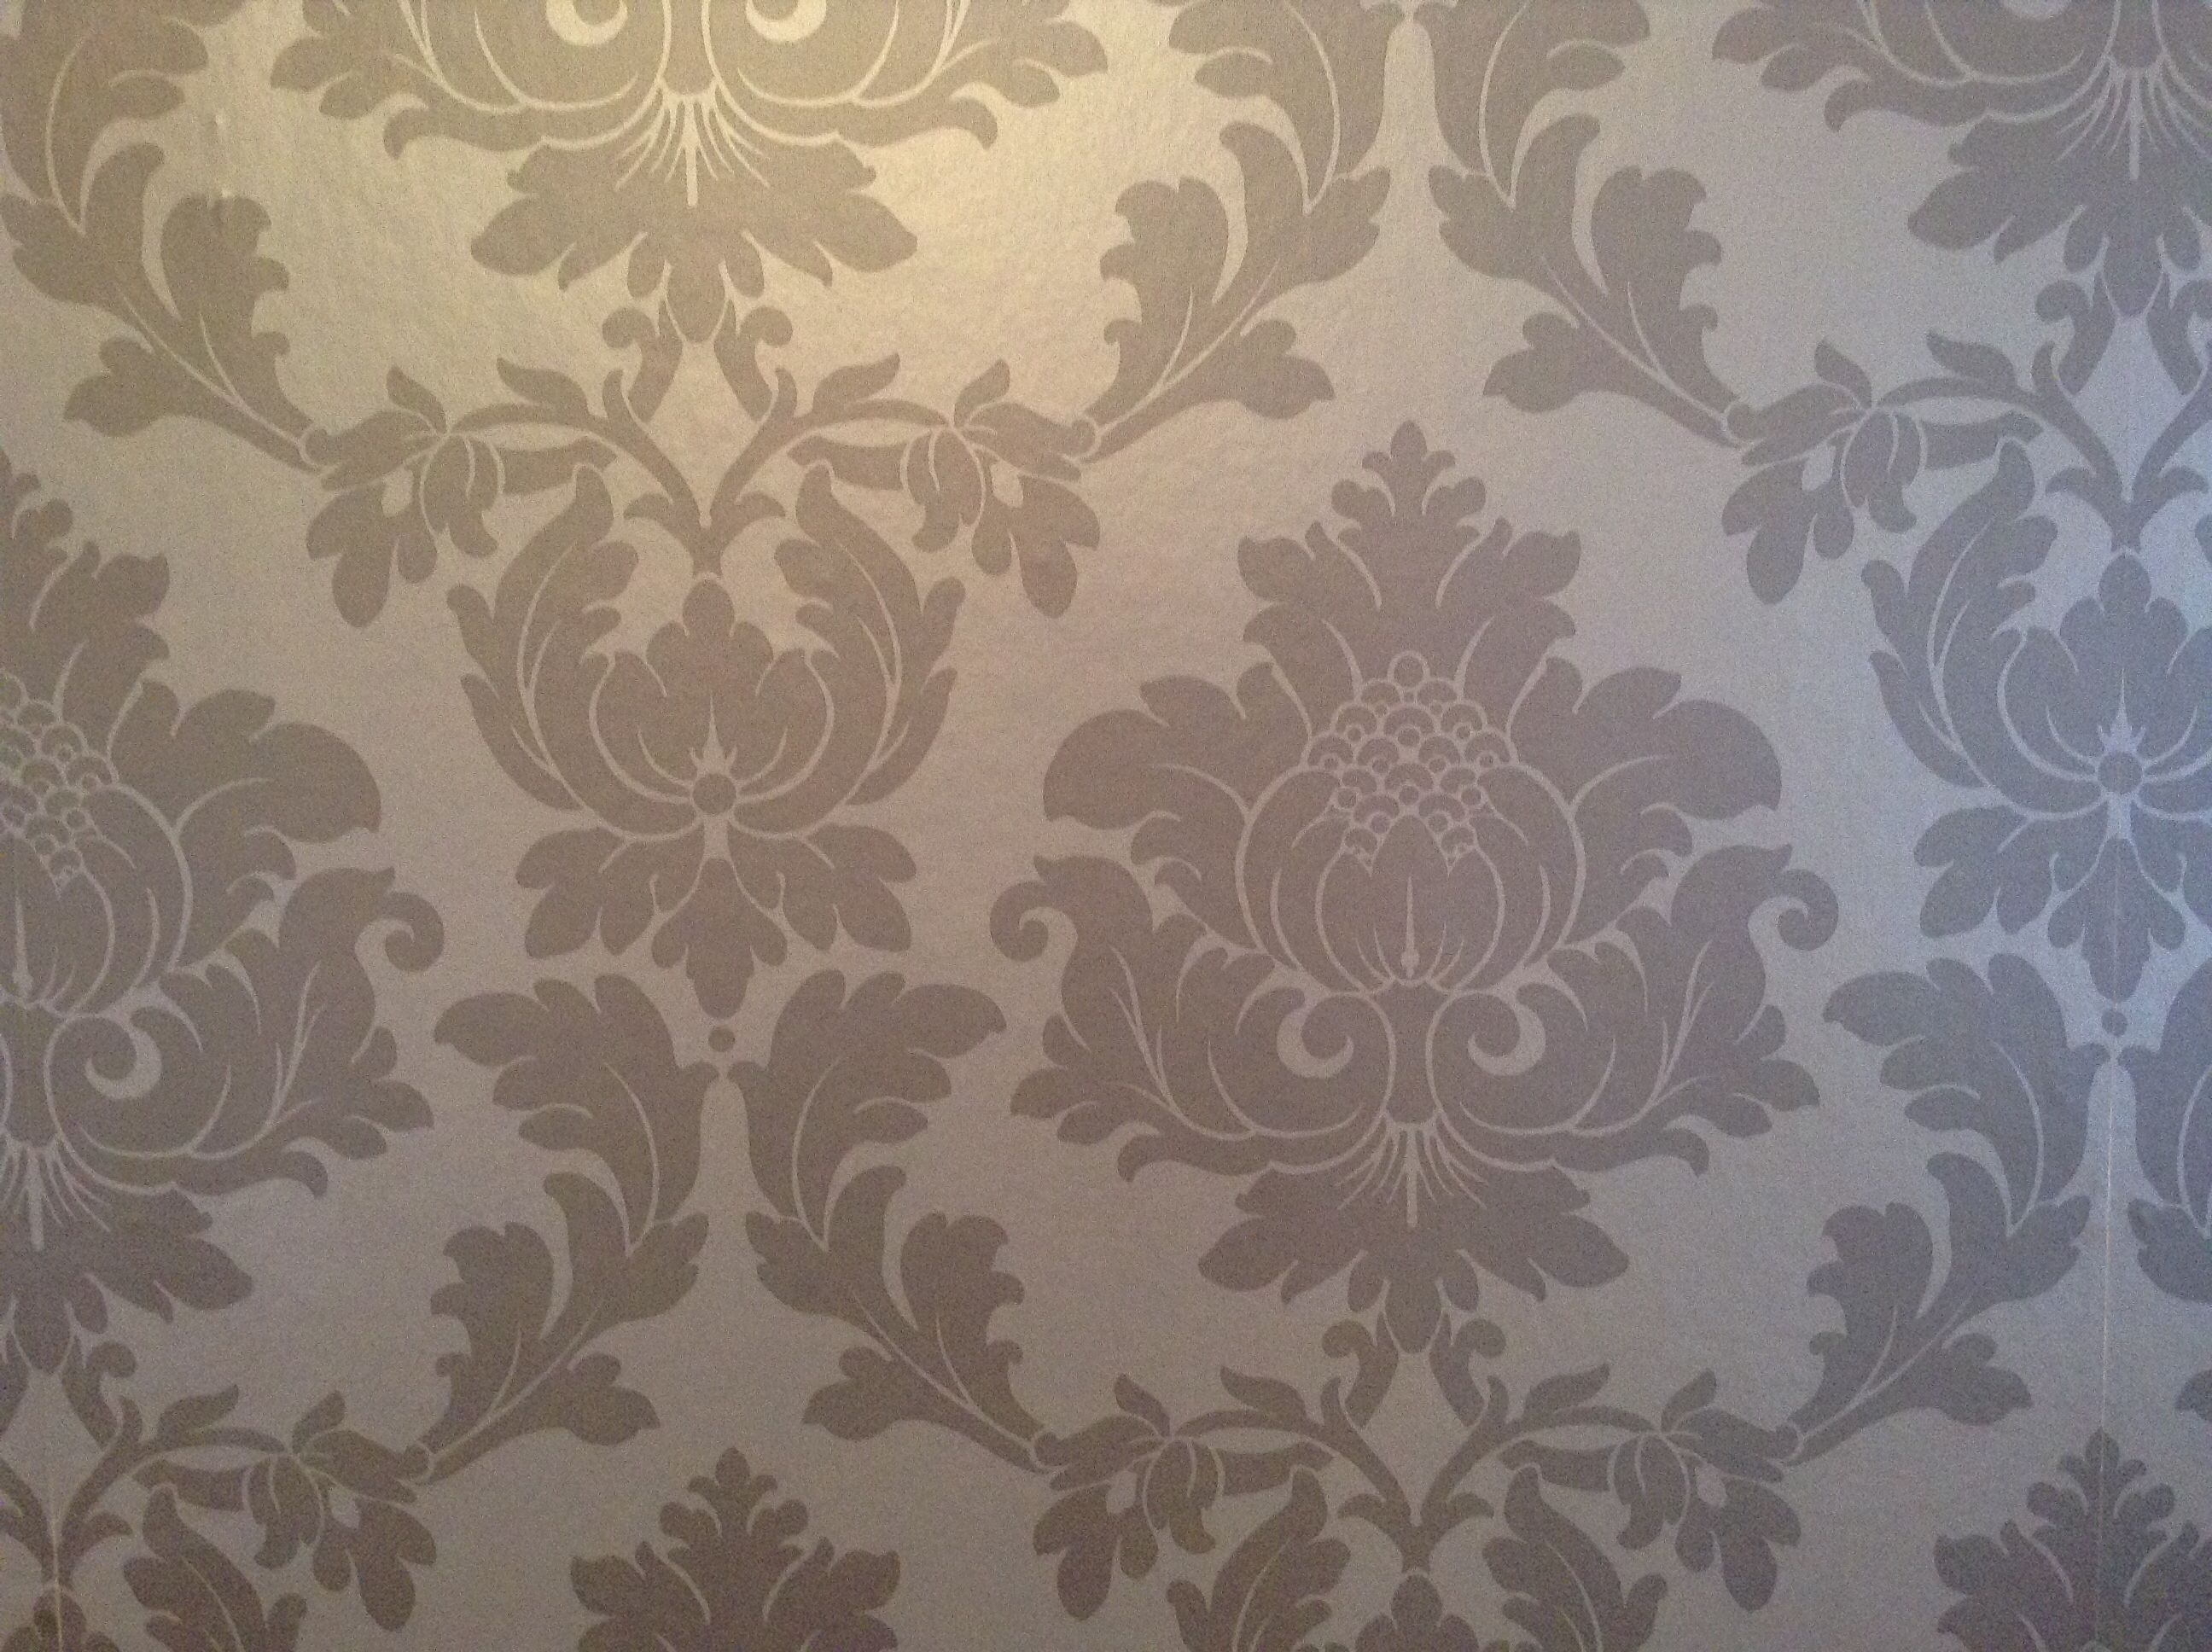 Mink Damask Print Wallpaper Print Wallpaper Room Wallpaper Fantastic Wallpapers